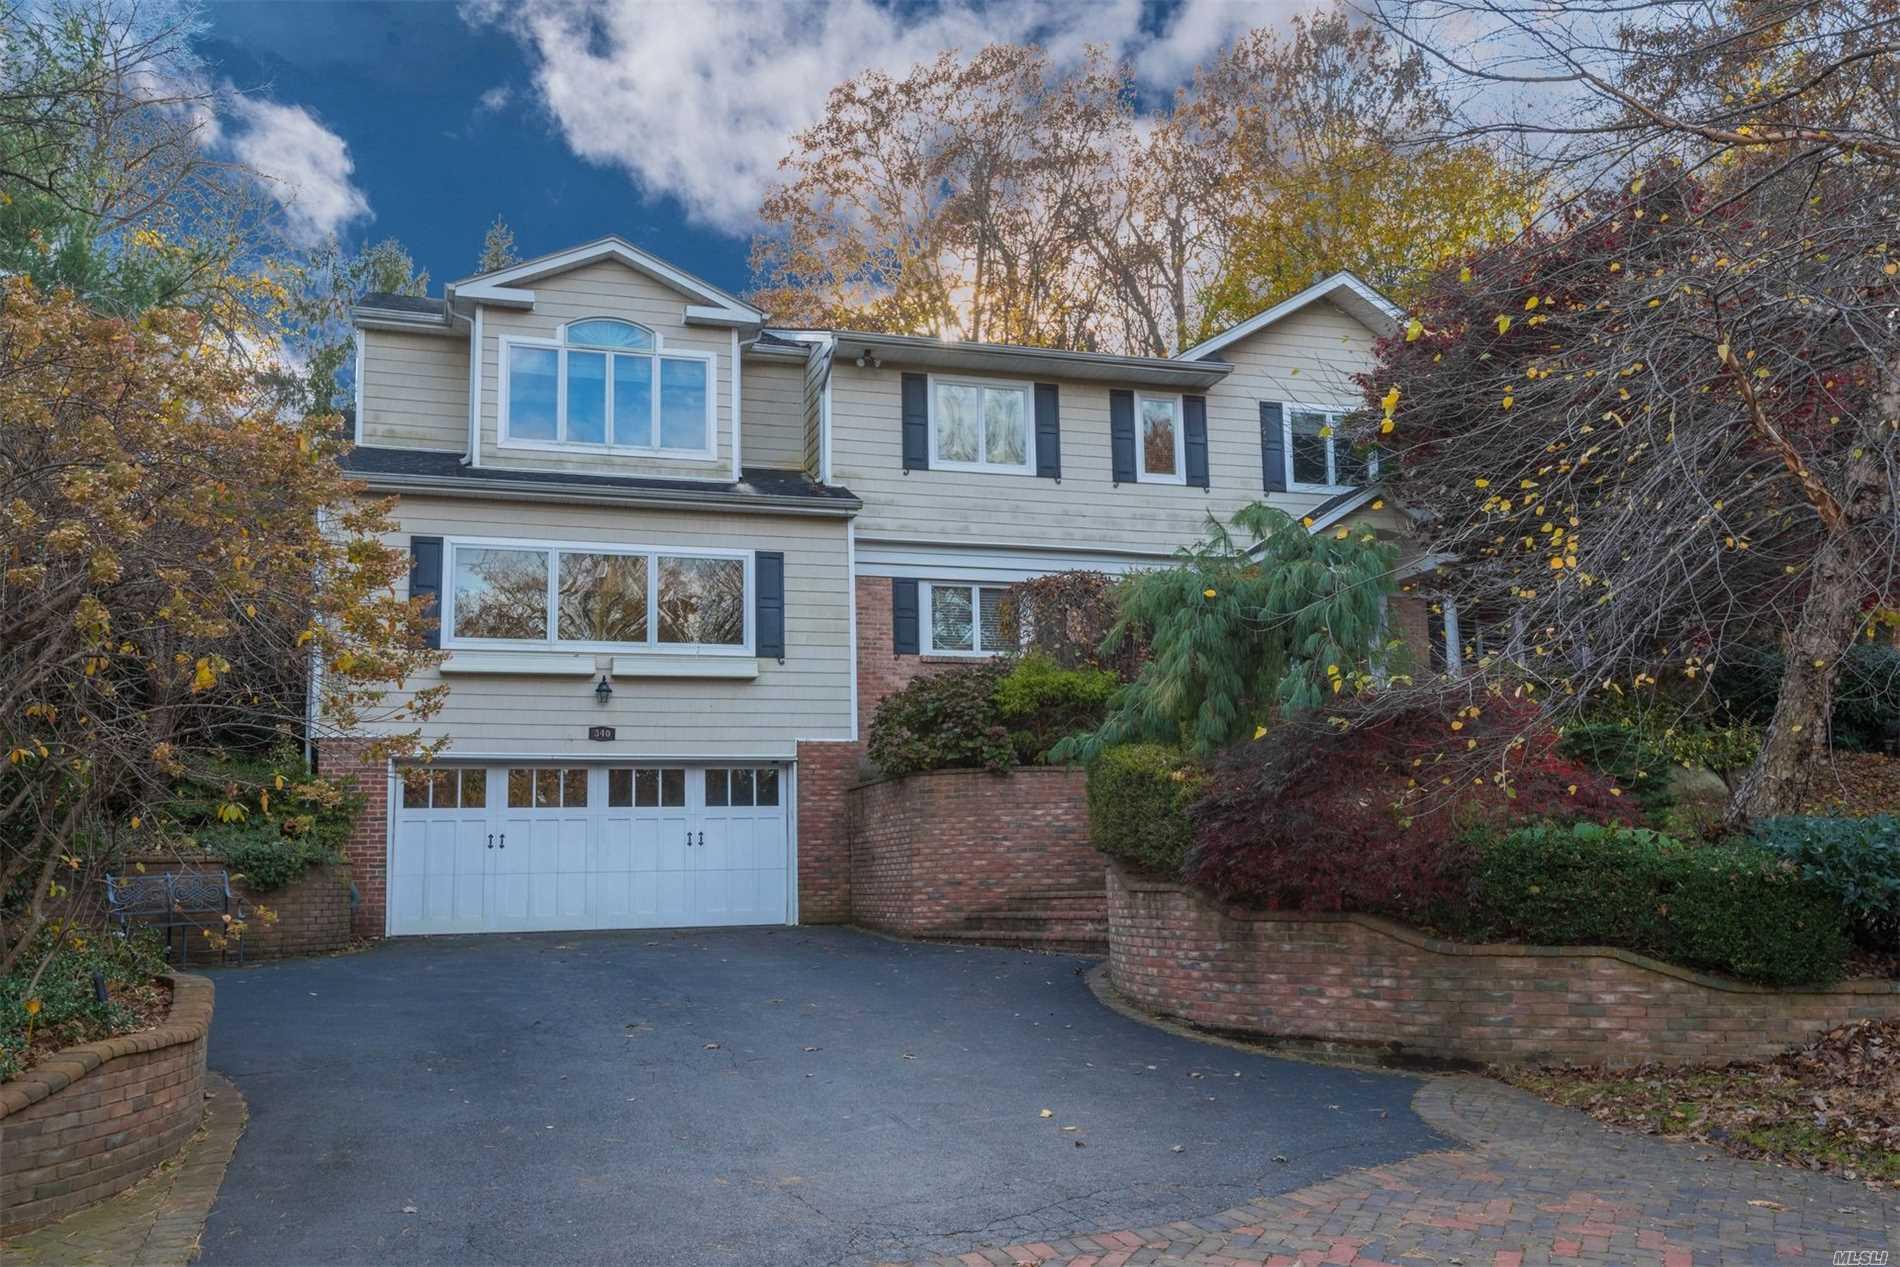 340 Chestnut Dr East Hills, NY 11576